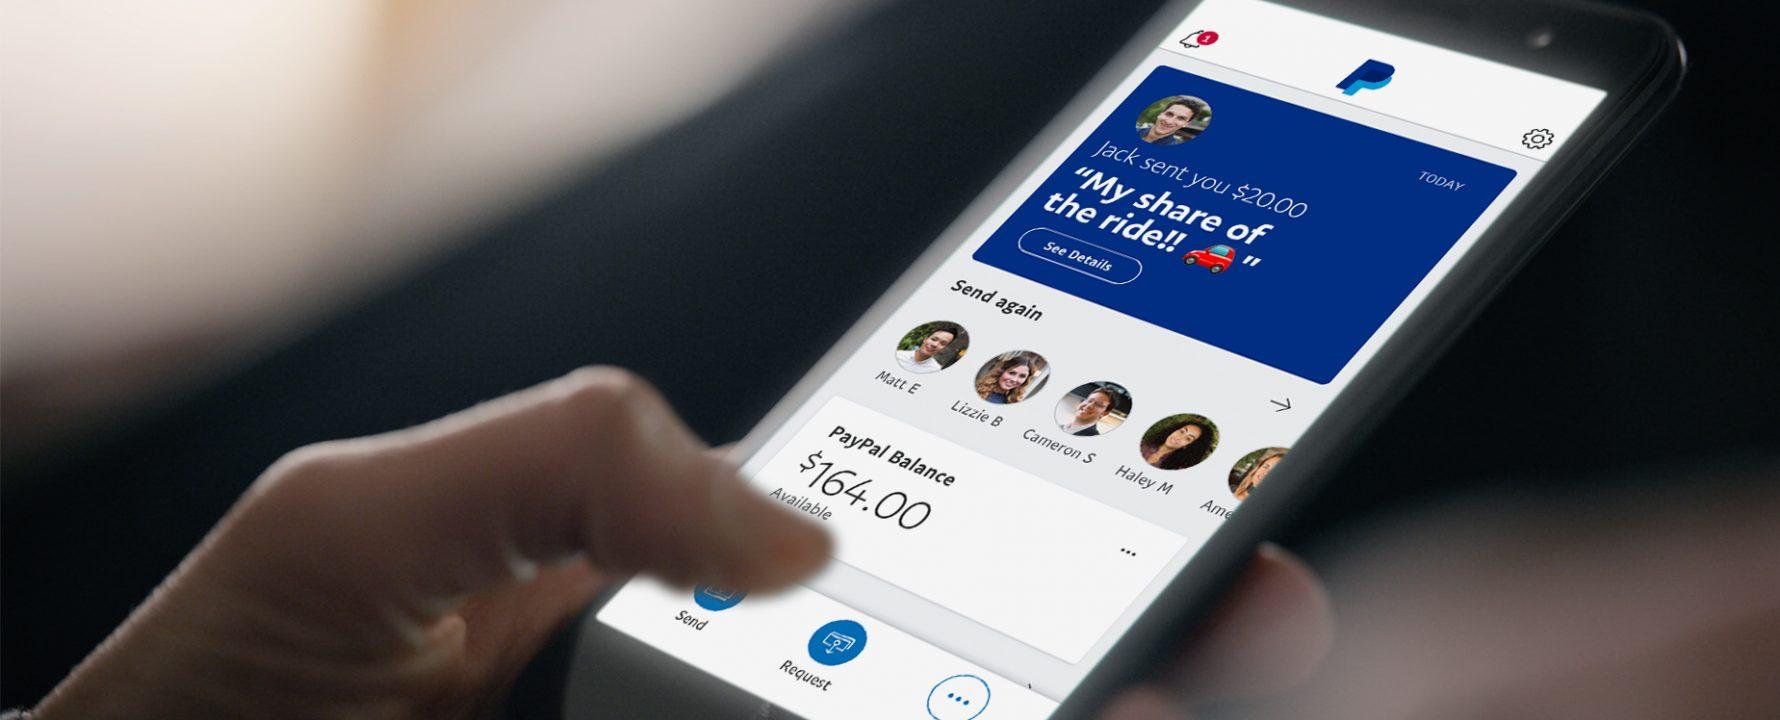 paypal-app-2018